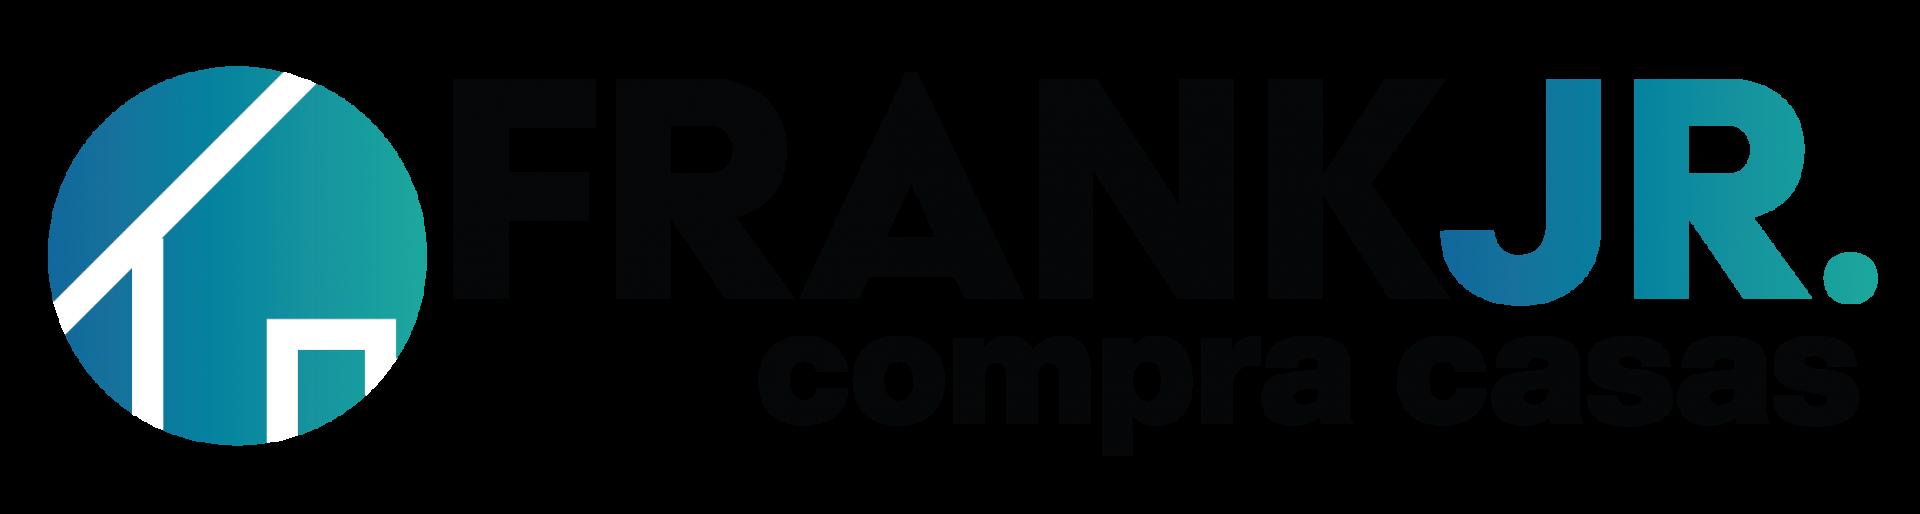 Frank Jr Compra Casas logo